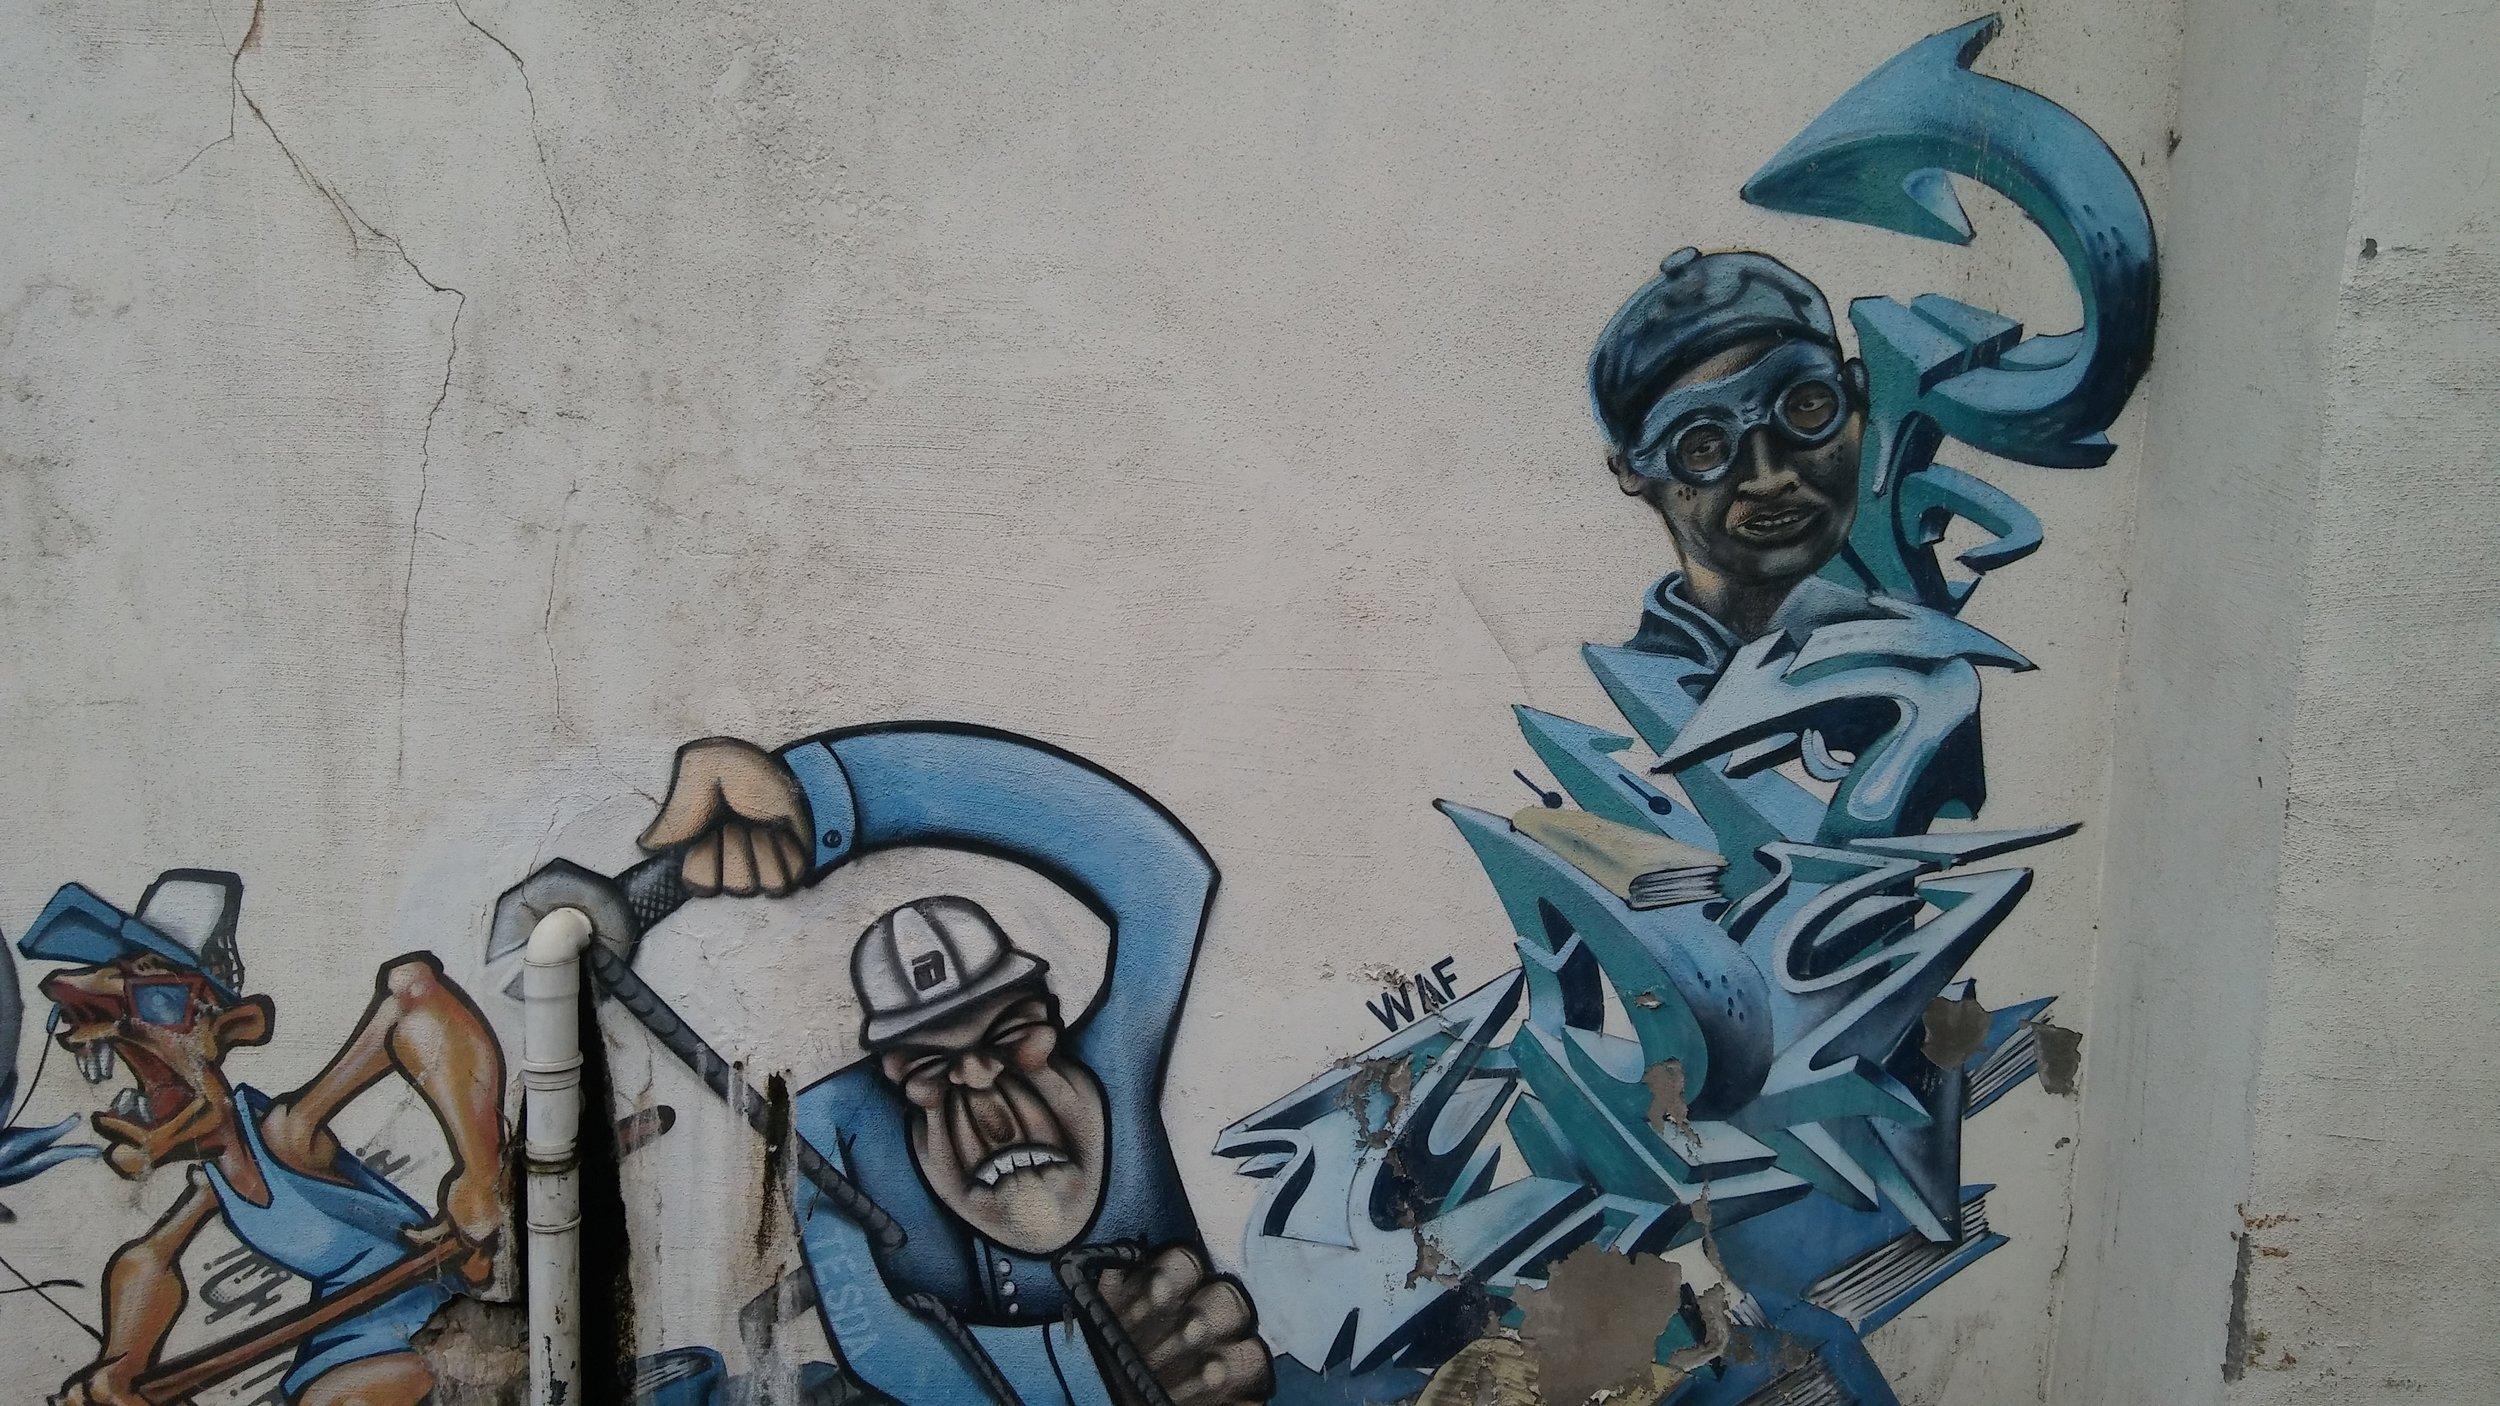 Heureusement il y a le street art